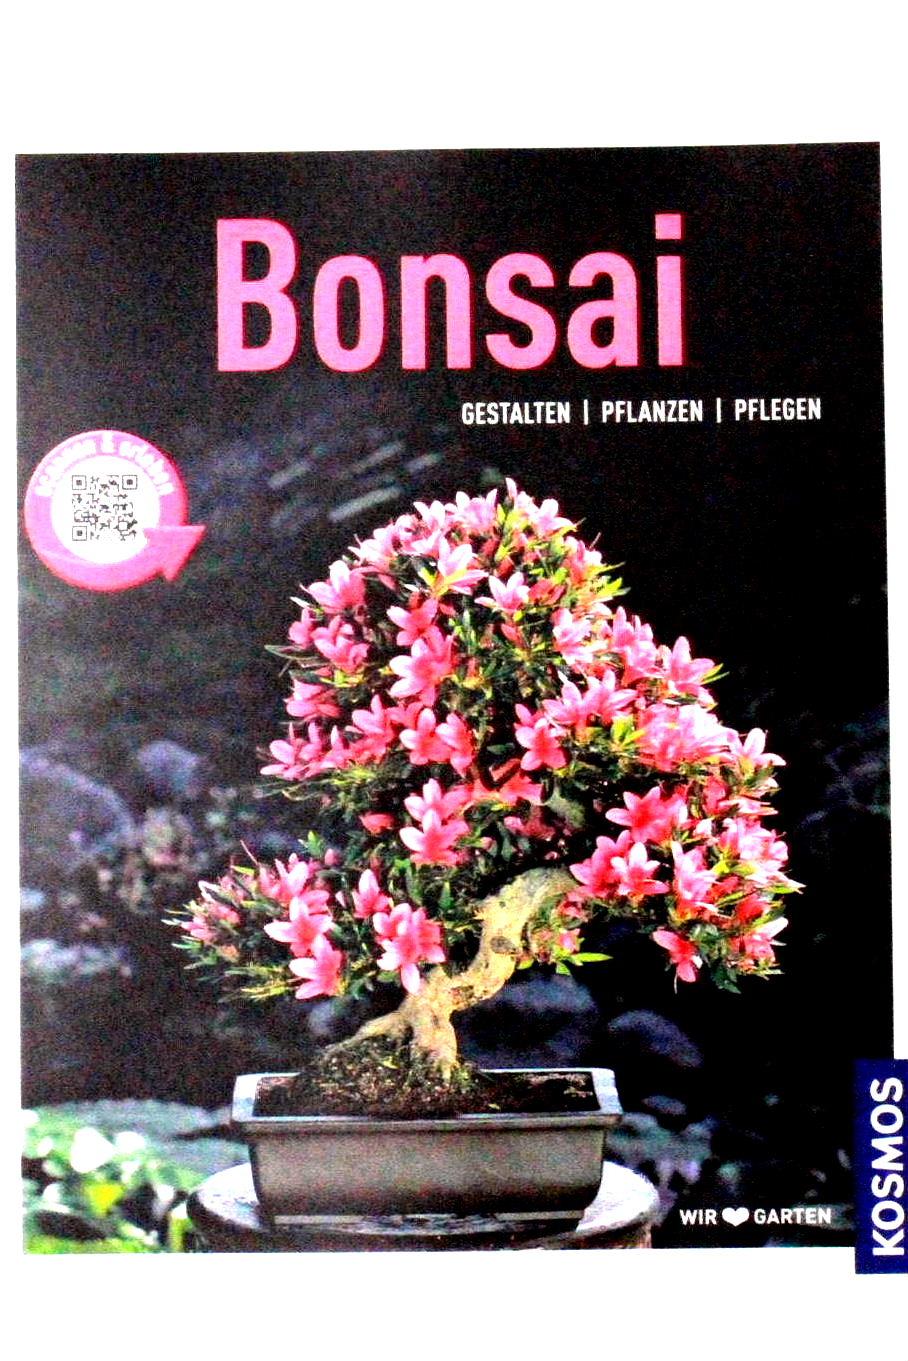 bonsai gestalten pflanzen pflegen bei oyaki bonsai kaufen. Black Bedroom Furniture Sets. Home Design Ideas